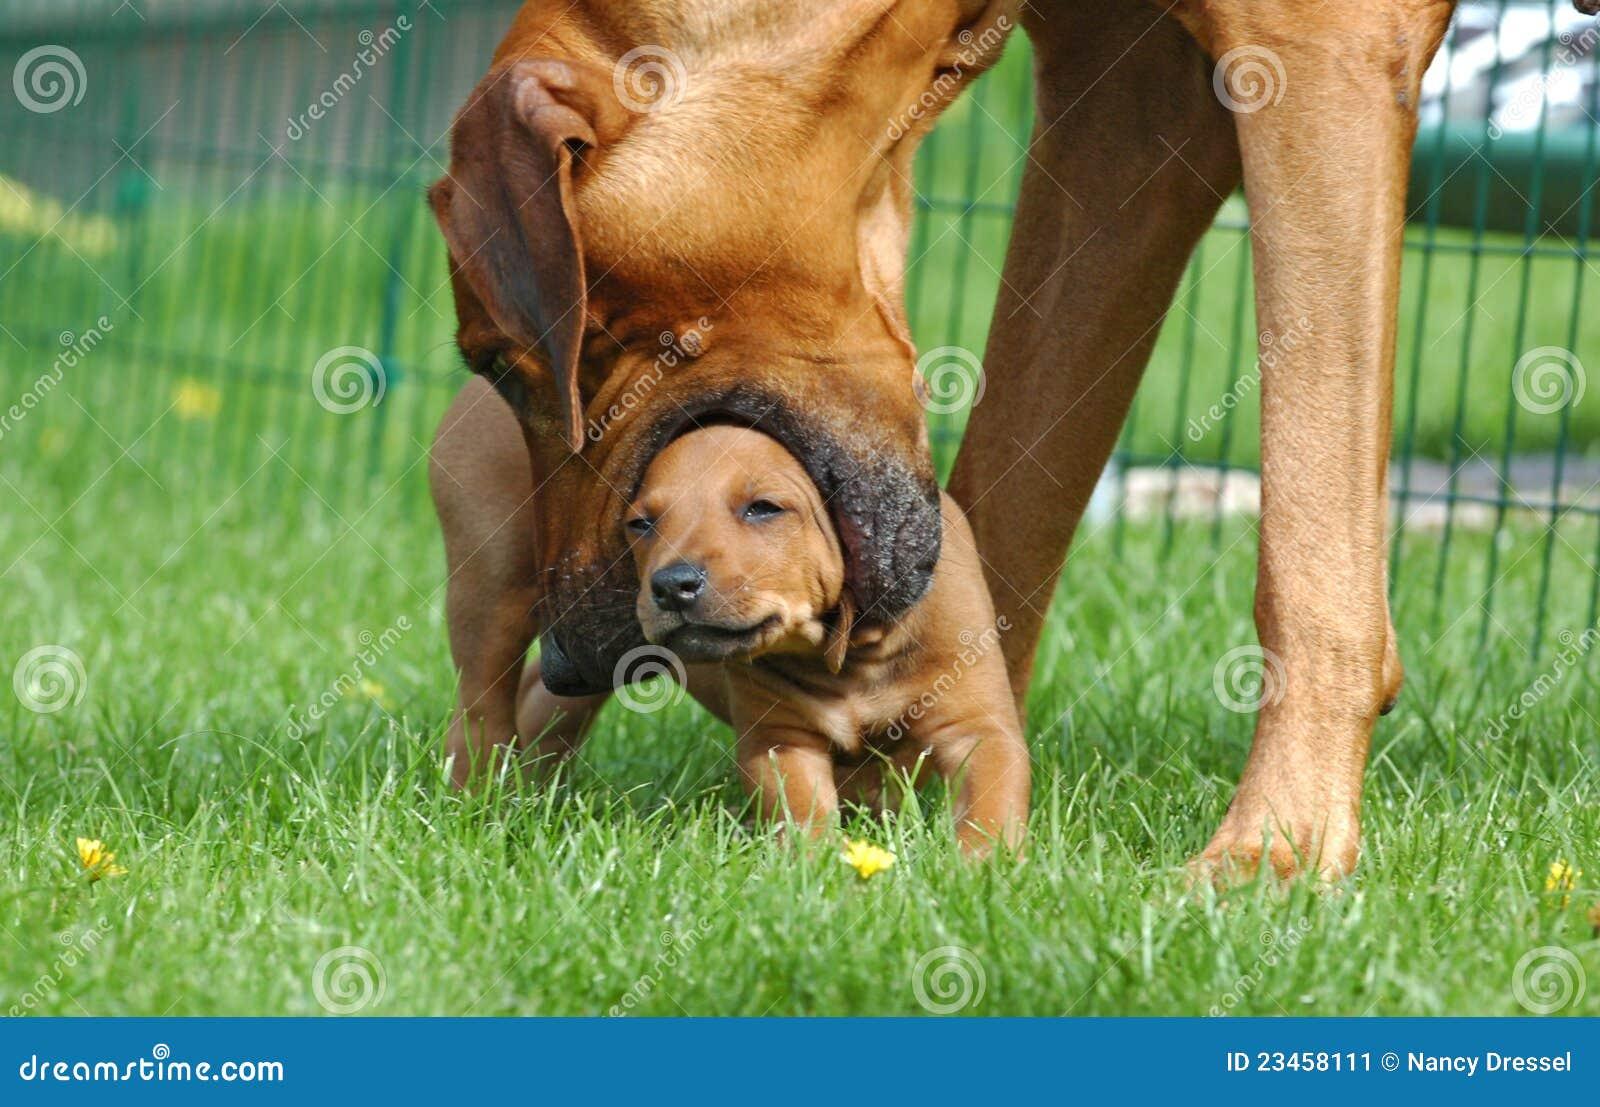 Female dog teaching puppy